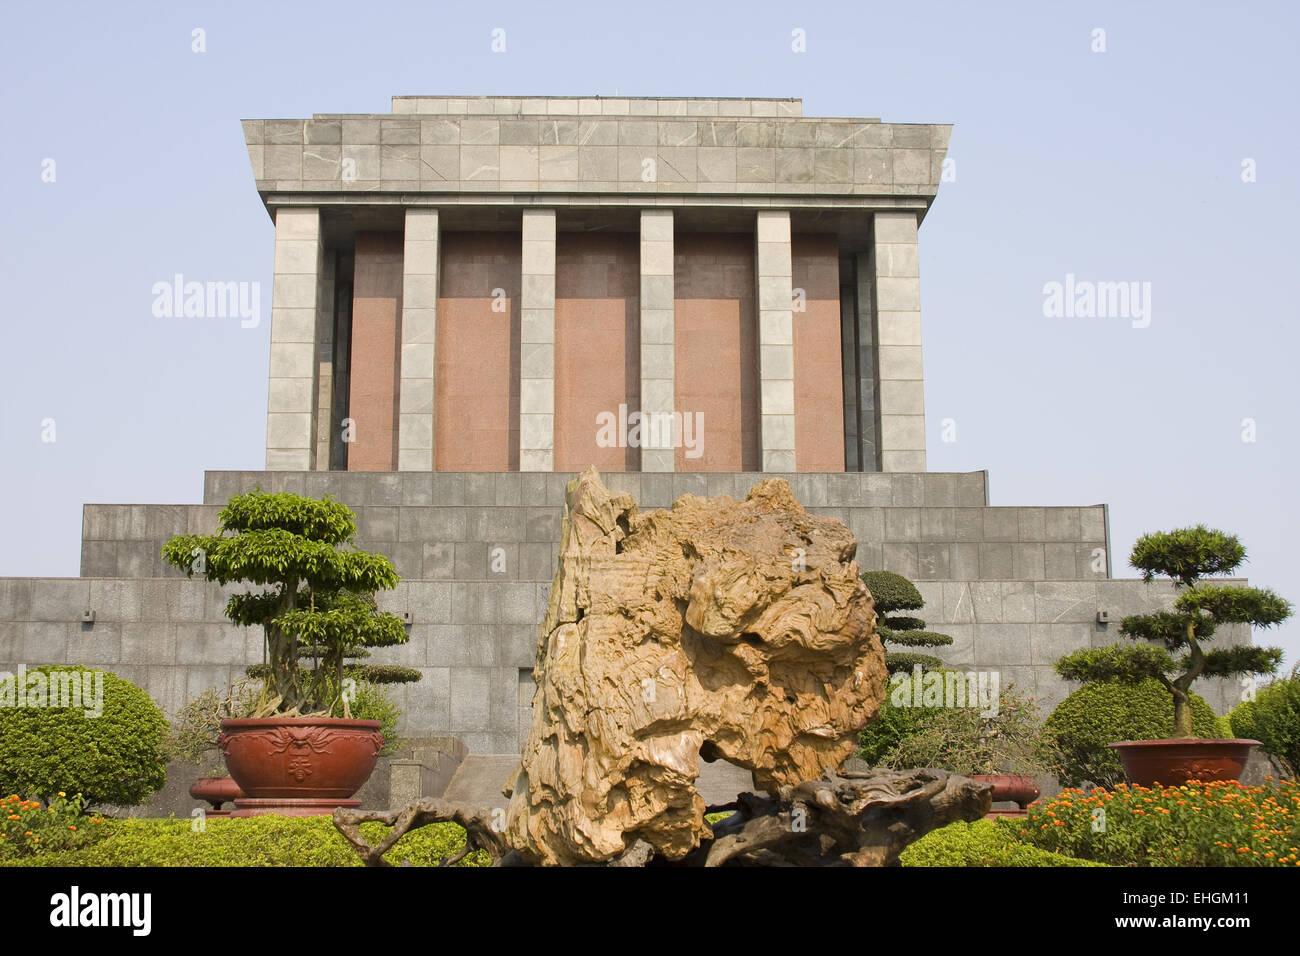 Ho Chi Minh Mausoleum, Hanoi, Vietnam, Asia - Stock Image